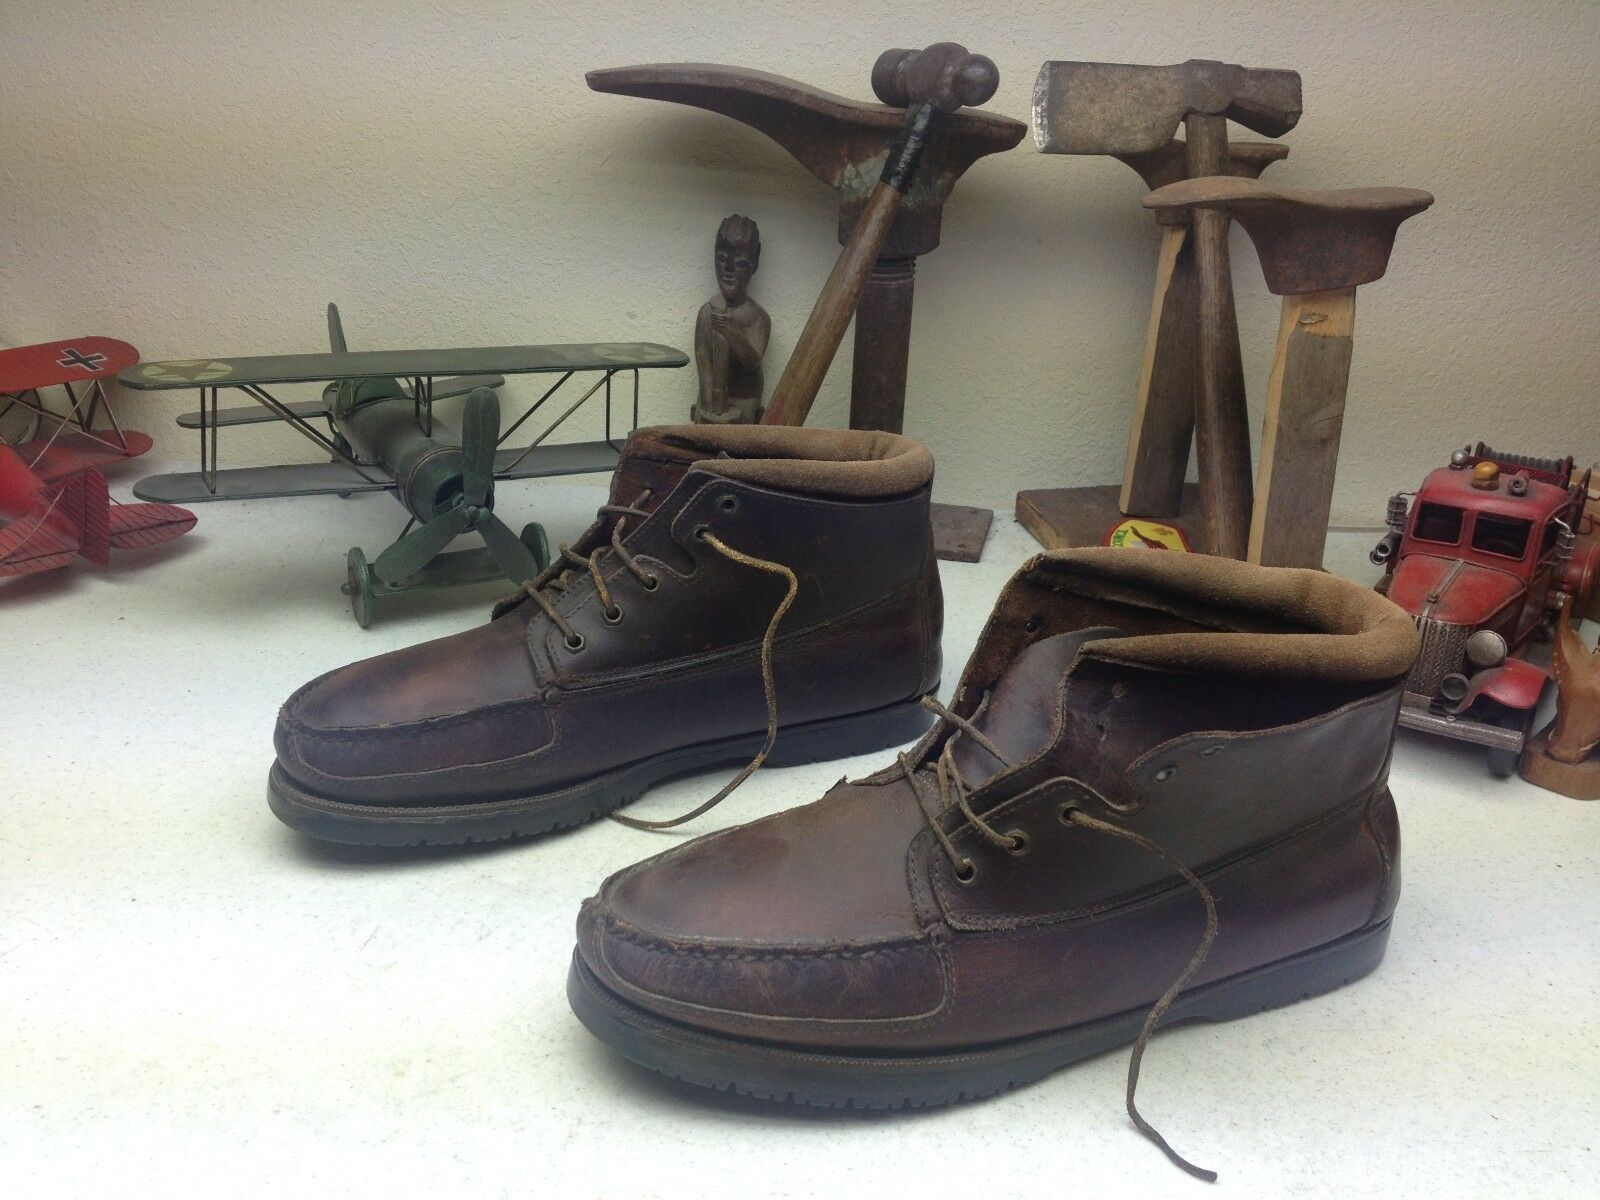 Vintage in aperta campagna brown angosciato ingegnere packer capo stivali 12 s